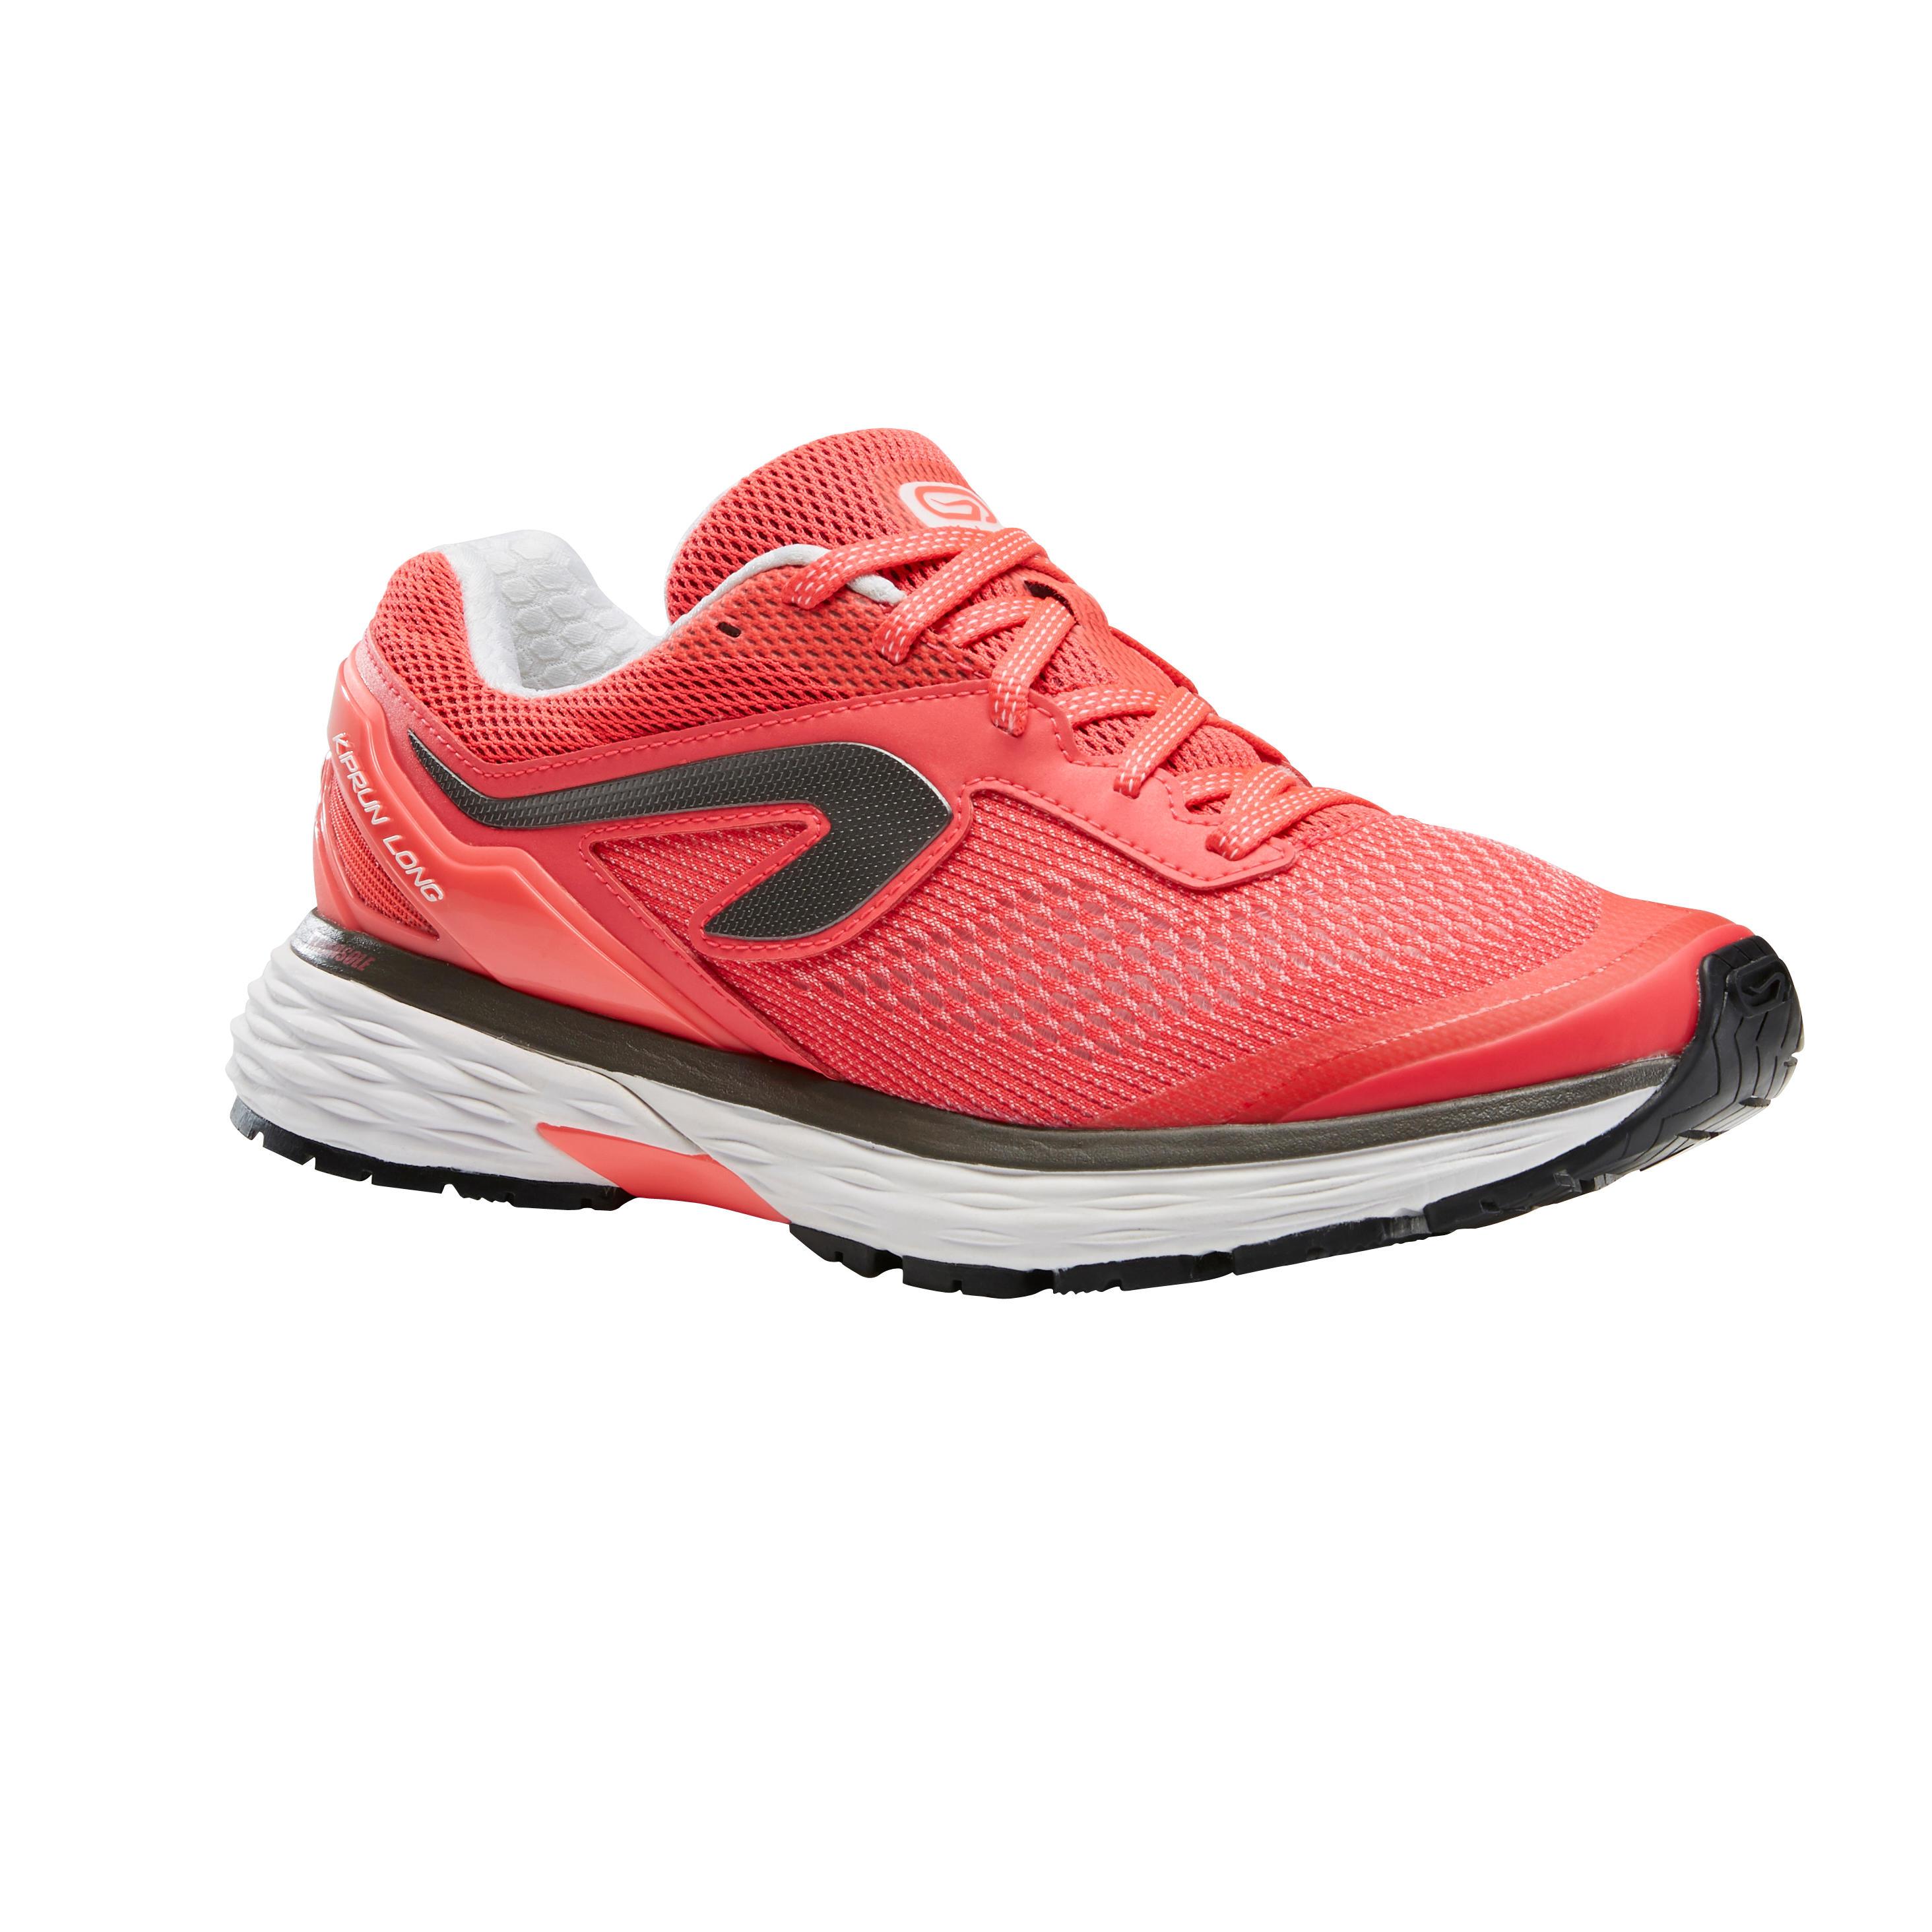 1d77560d153beb Laufschuhe für Damen online kaufen